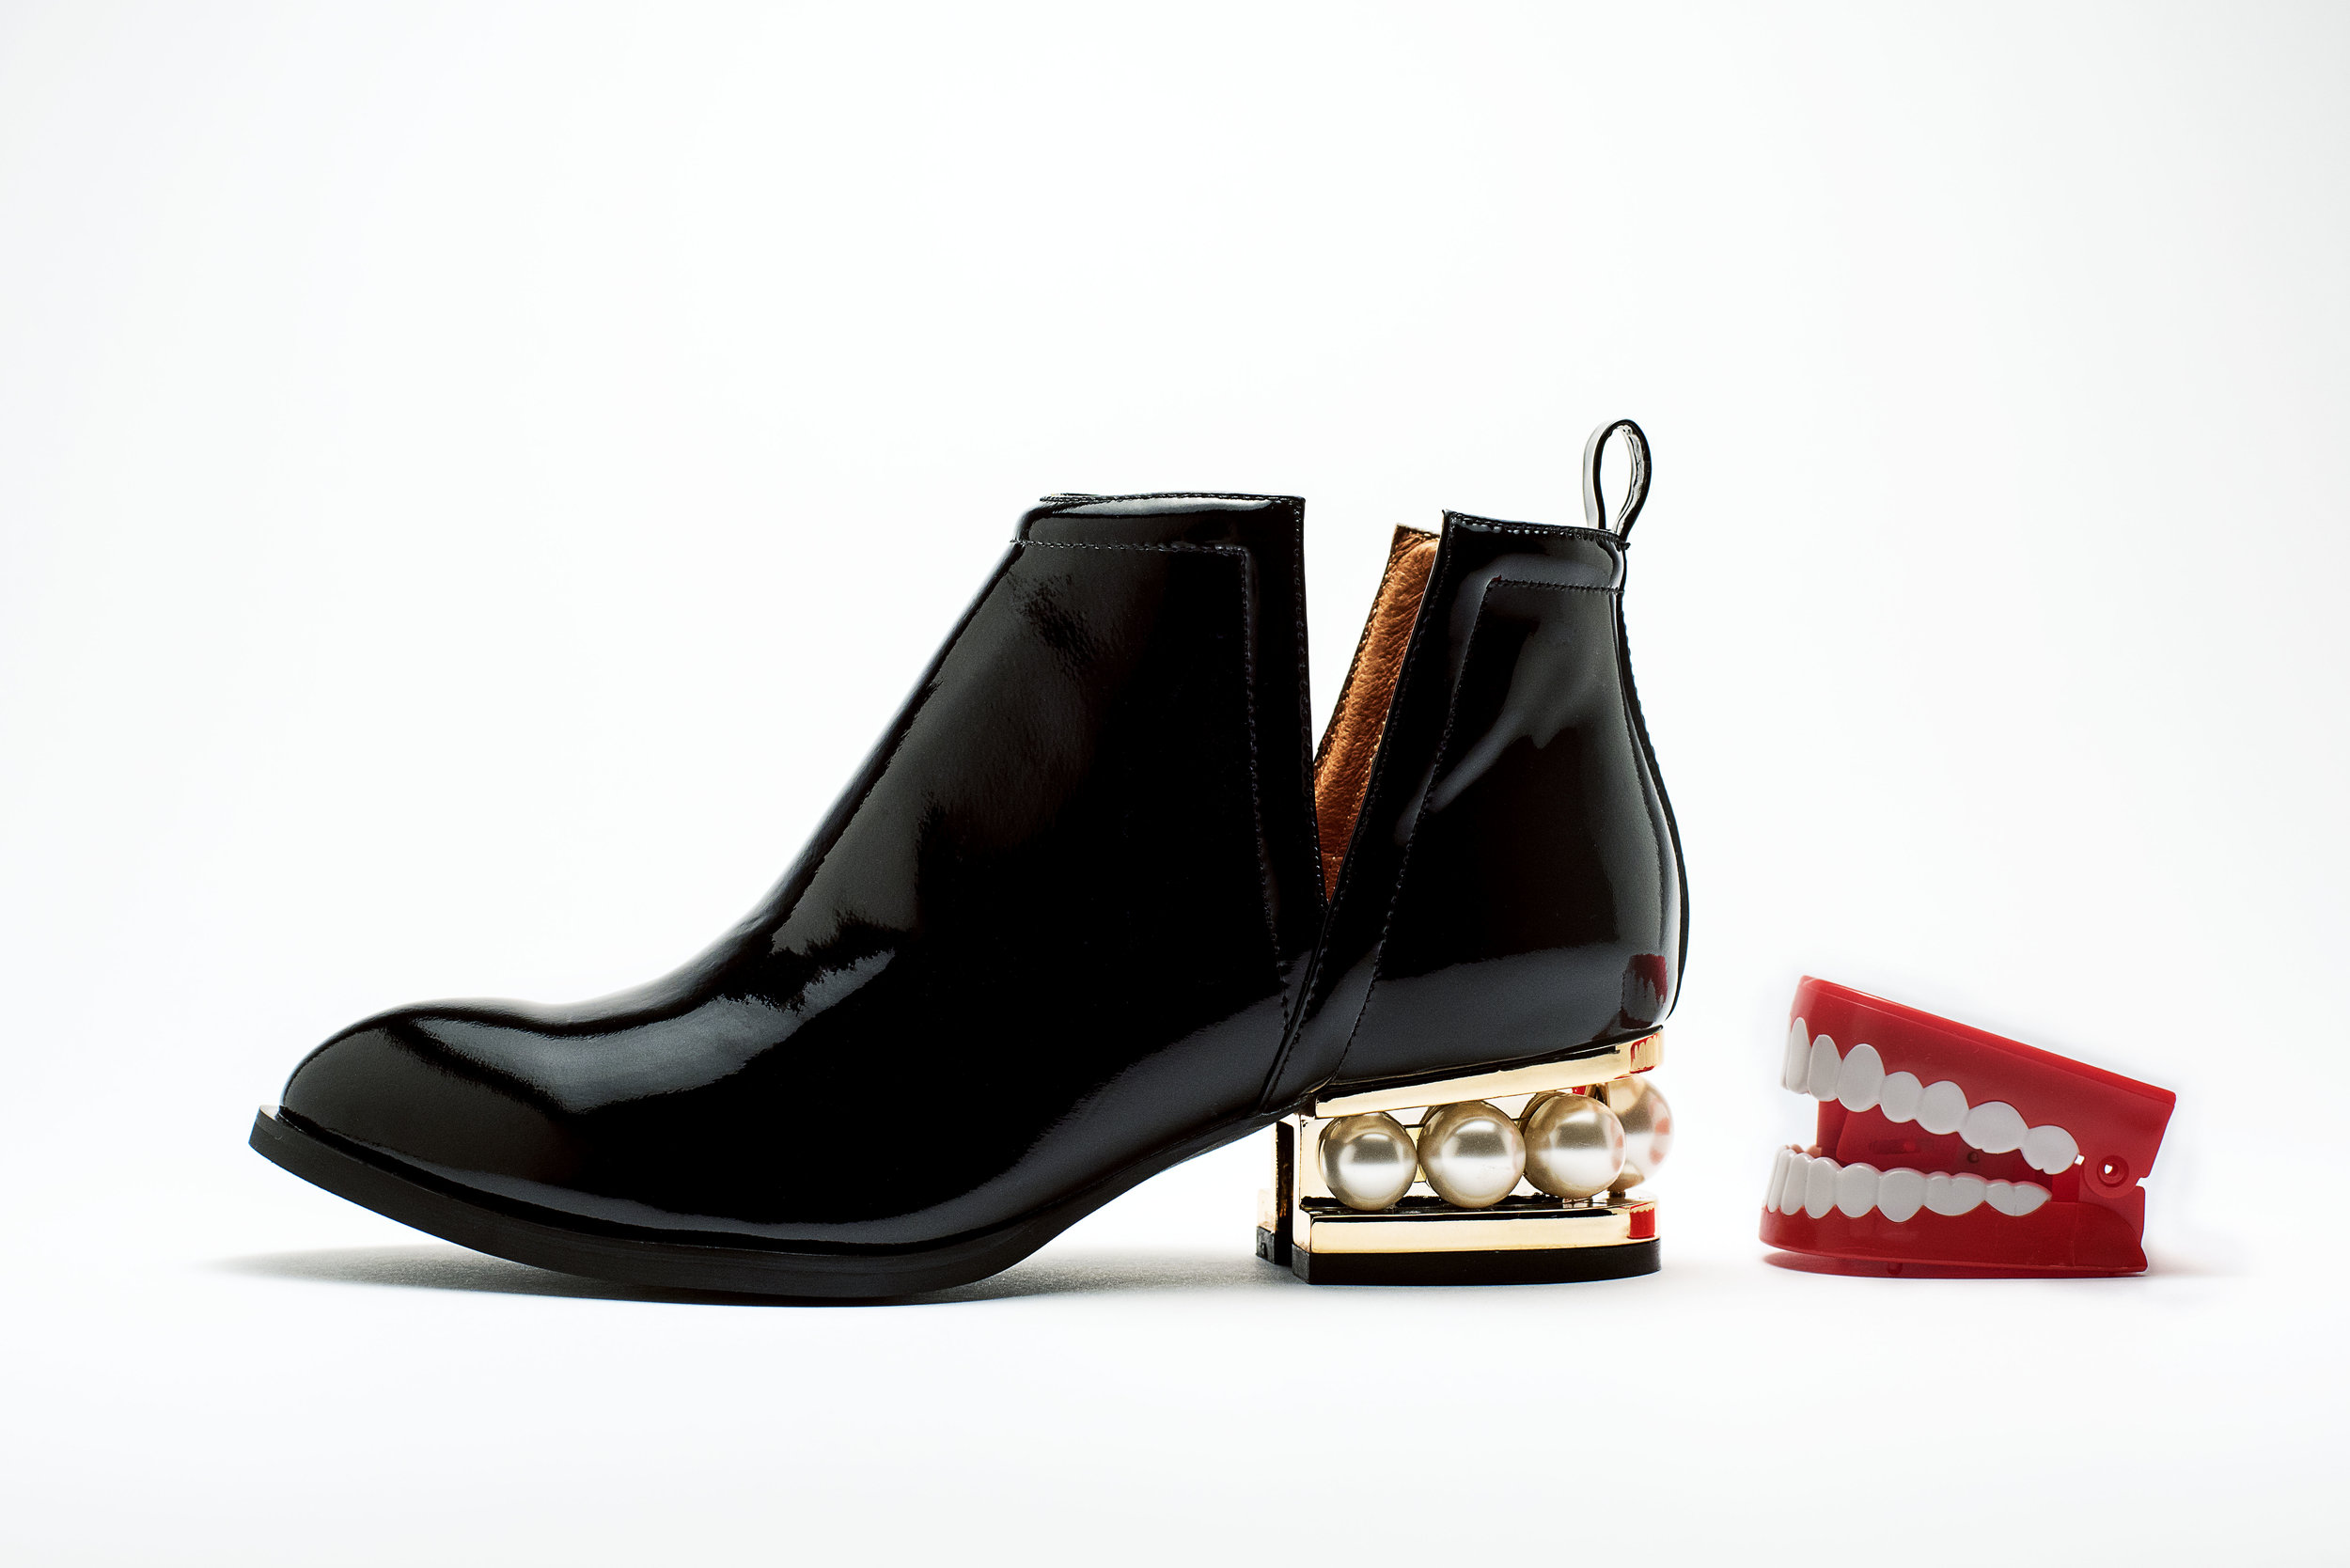 JCShoes-8.jpg